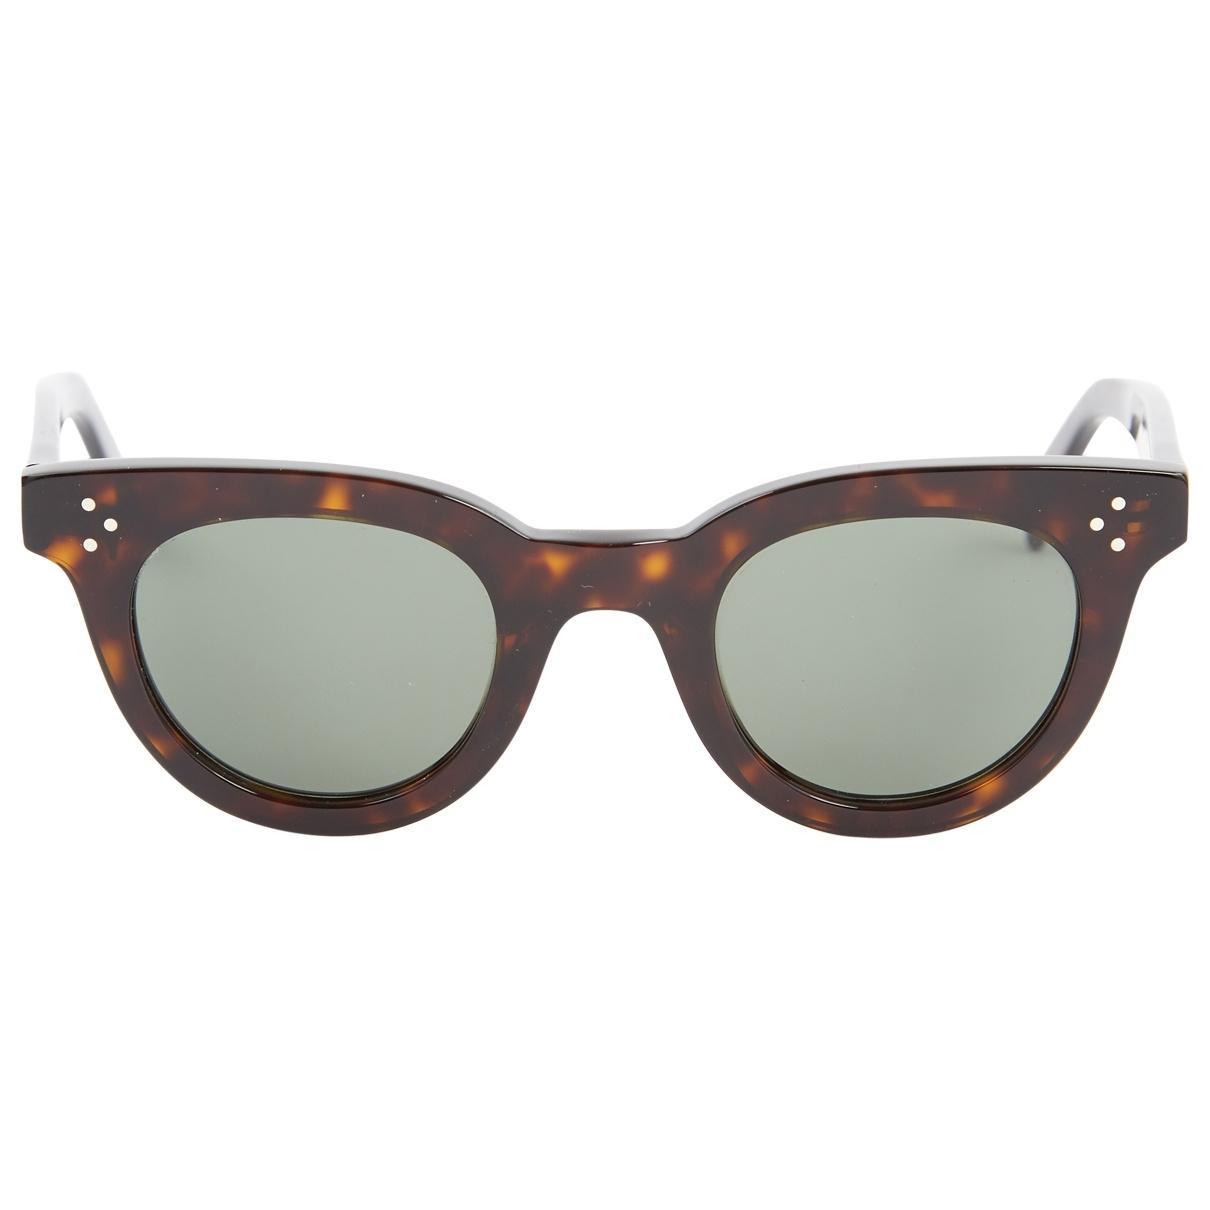 52cd6726ca75b Lyst - Céline Pre-owned Brown Plastic Sunglasses in Brown